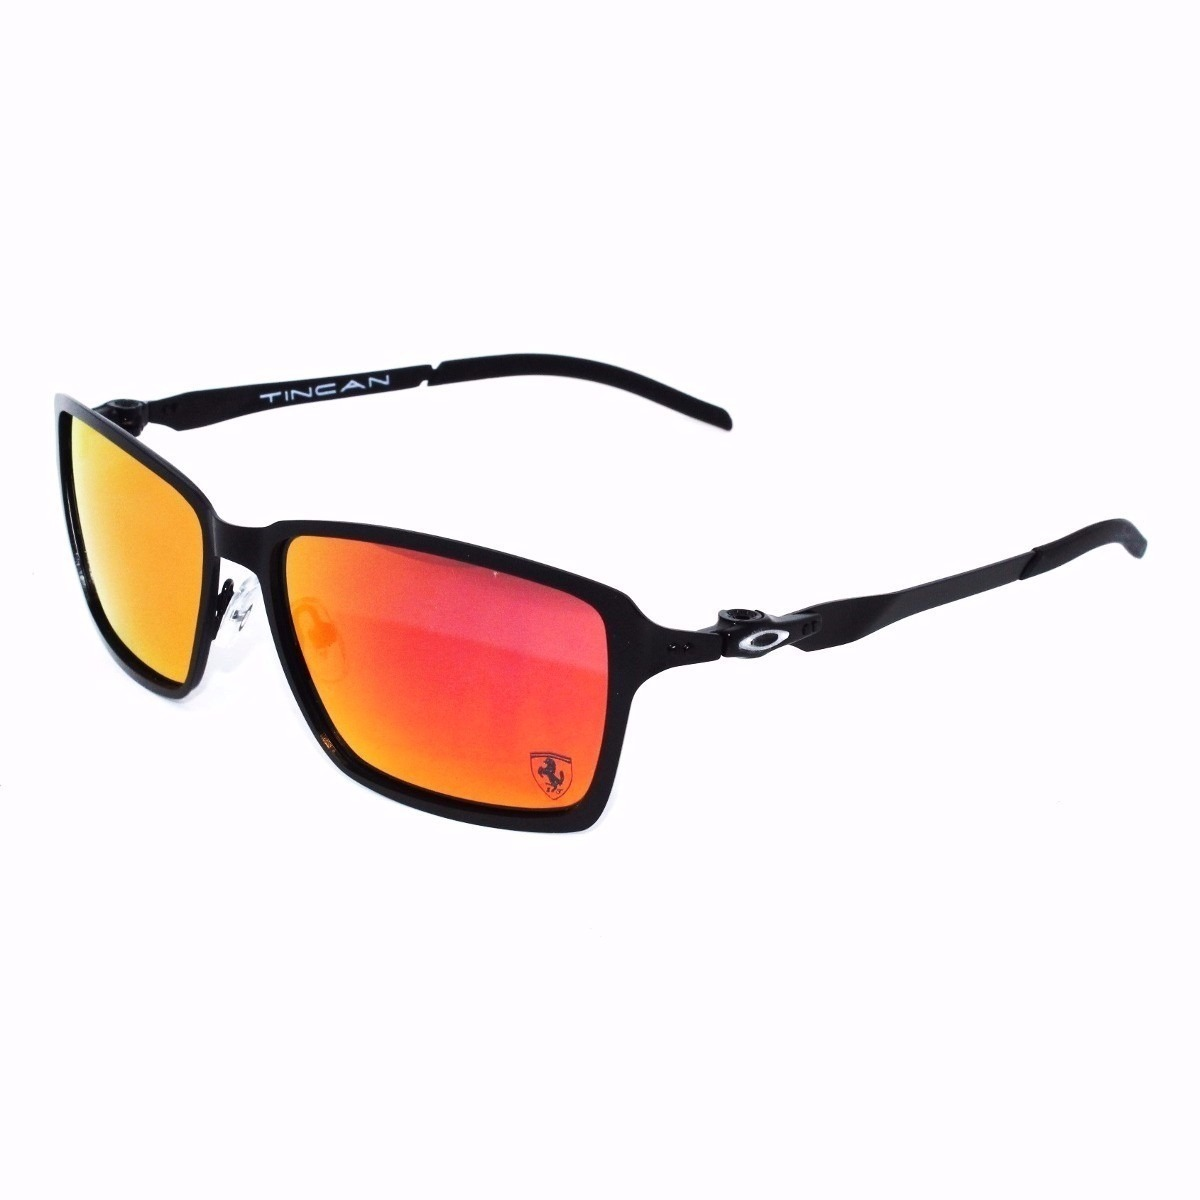 ec732574ab óculos oakley tincan ferrari masculino polarizado promoção!! Carregando  zoom.